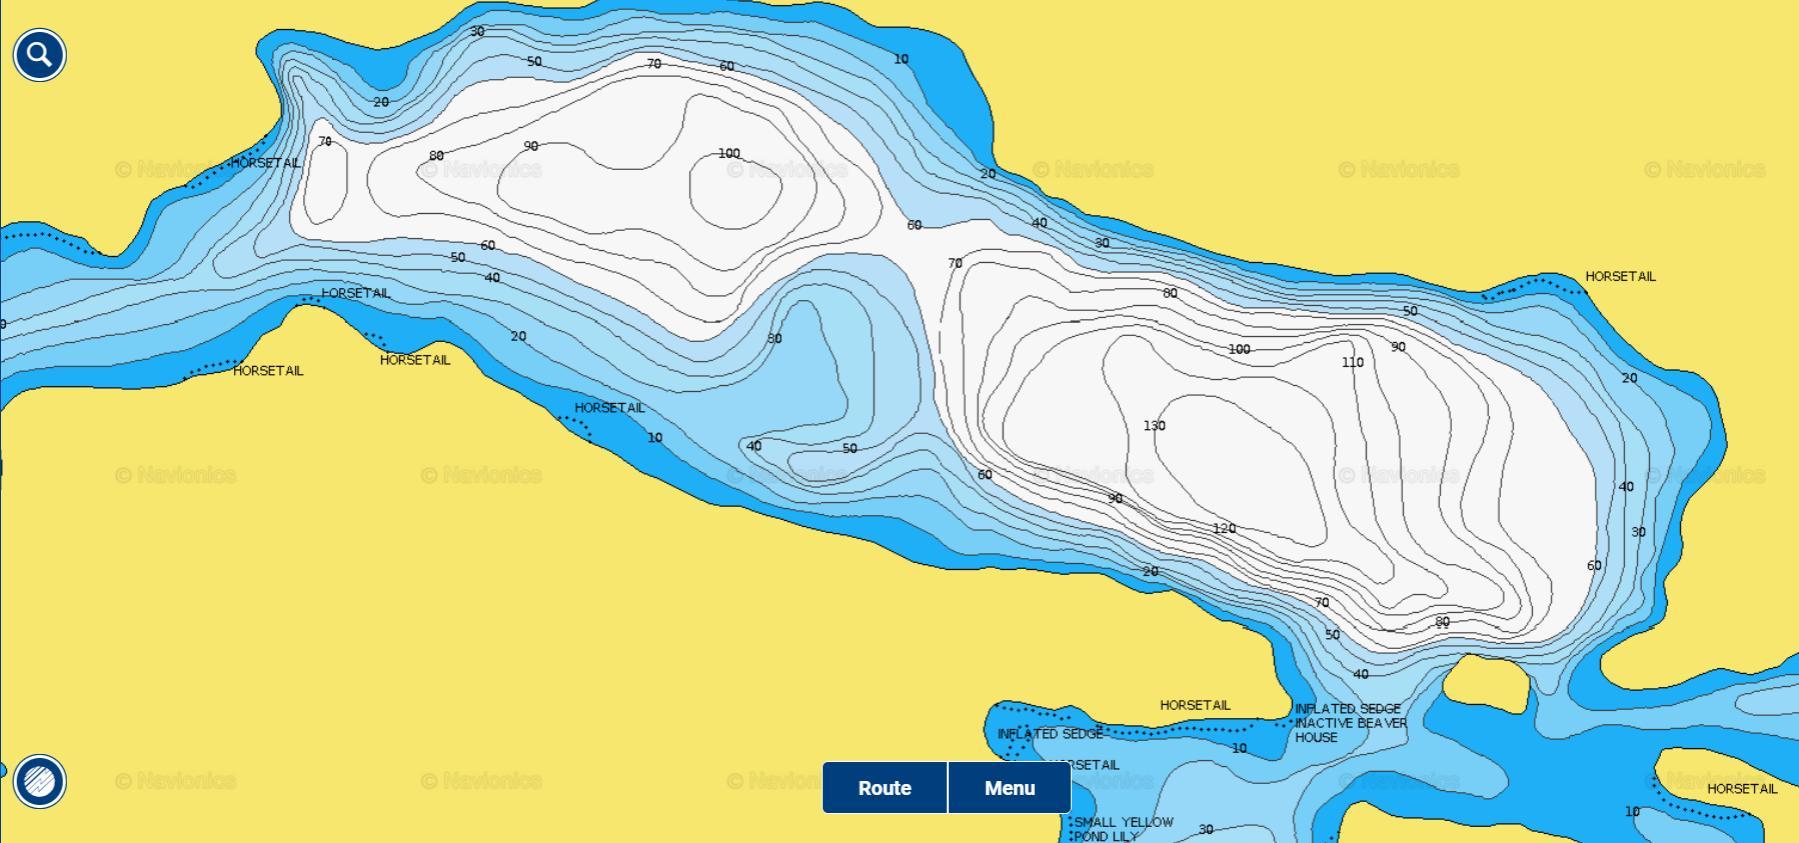 BWCA BW lake depth maps Boundary Waters Forum Map Of Bwca Lakes on map of mn lakes, map of ely lakes, map of minnesota lakes, map of eastern united states lakes, map of gunflint trail lakes,